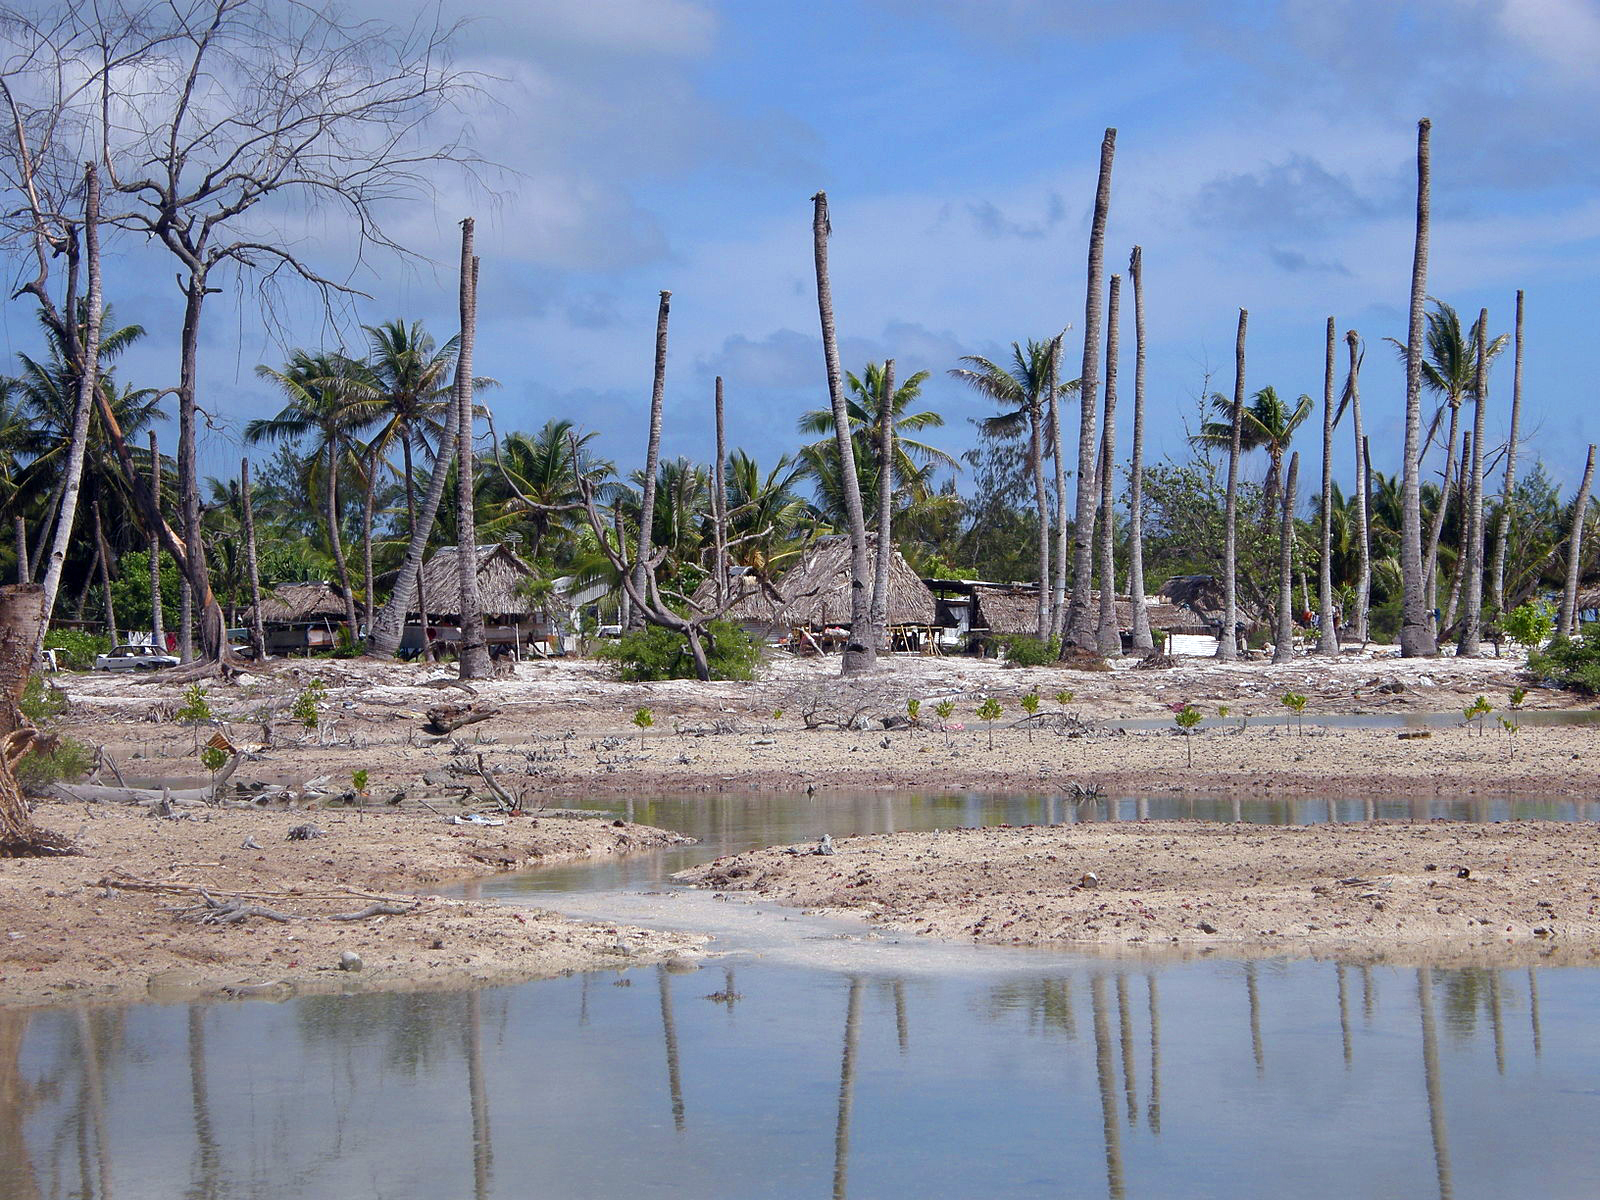 Seeking refuge in the climate emergency | Penn Today